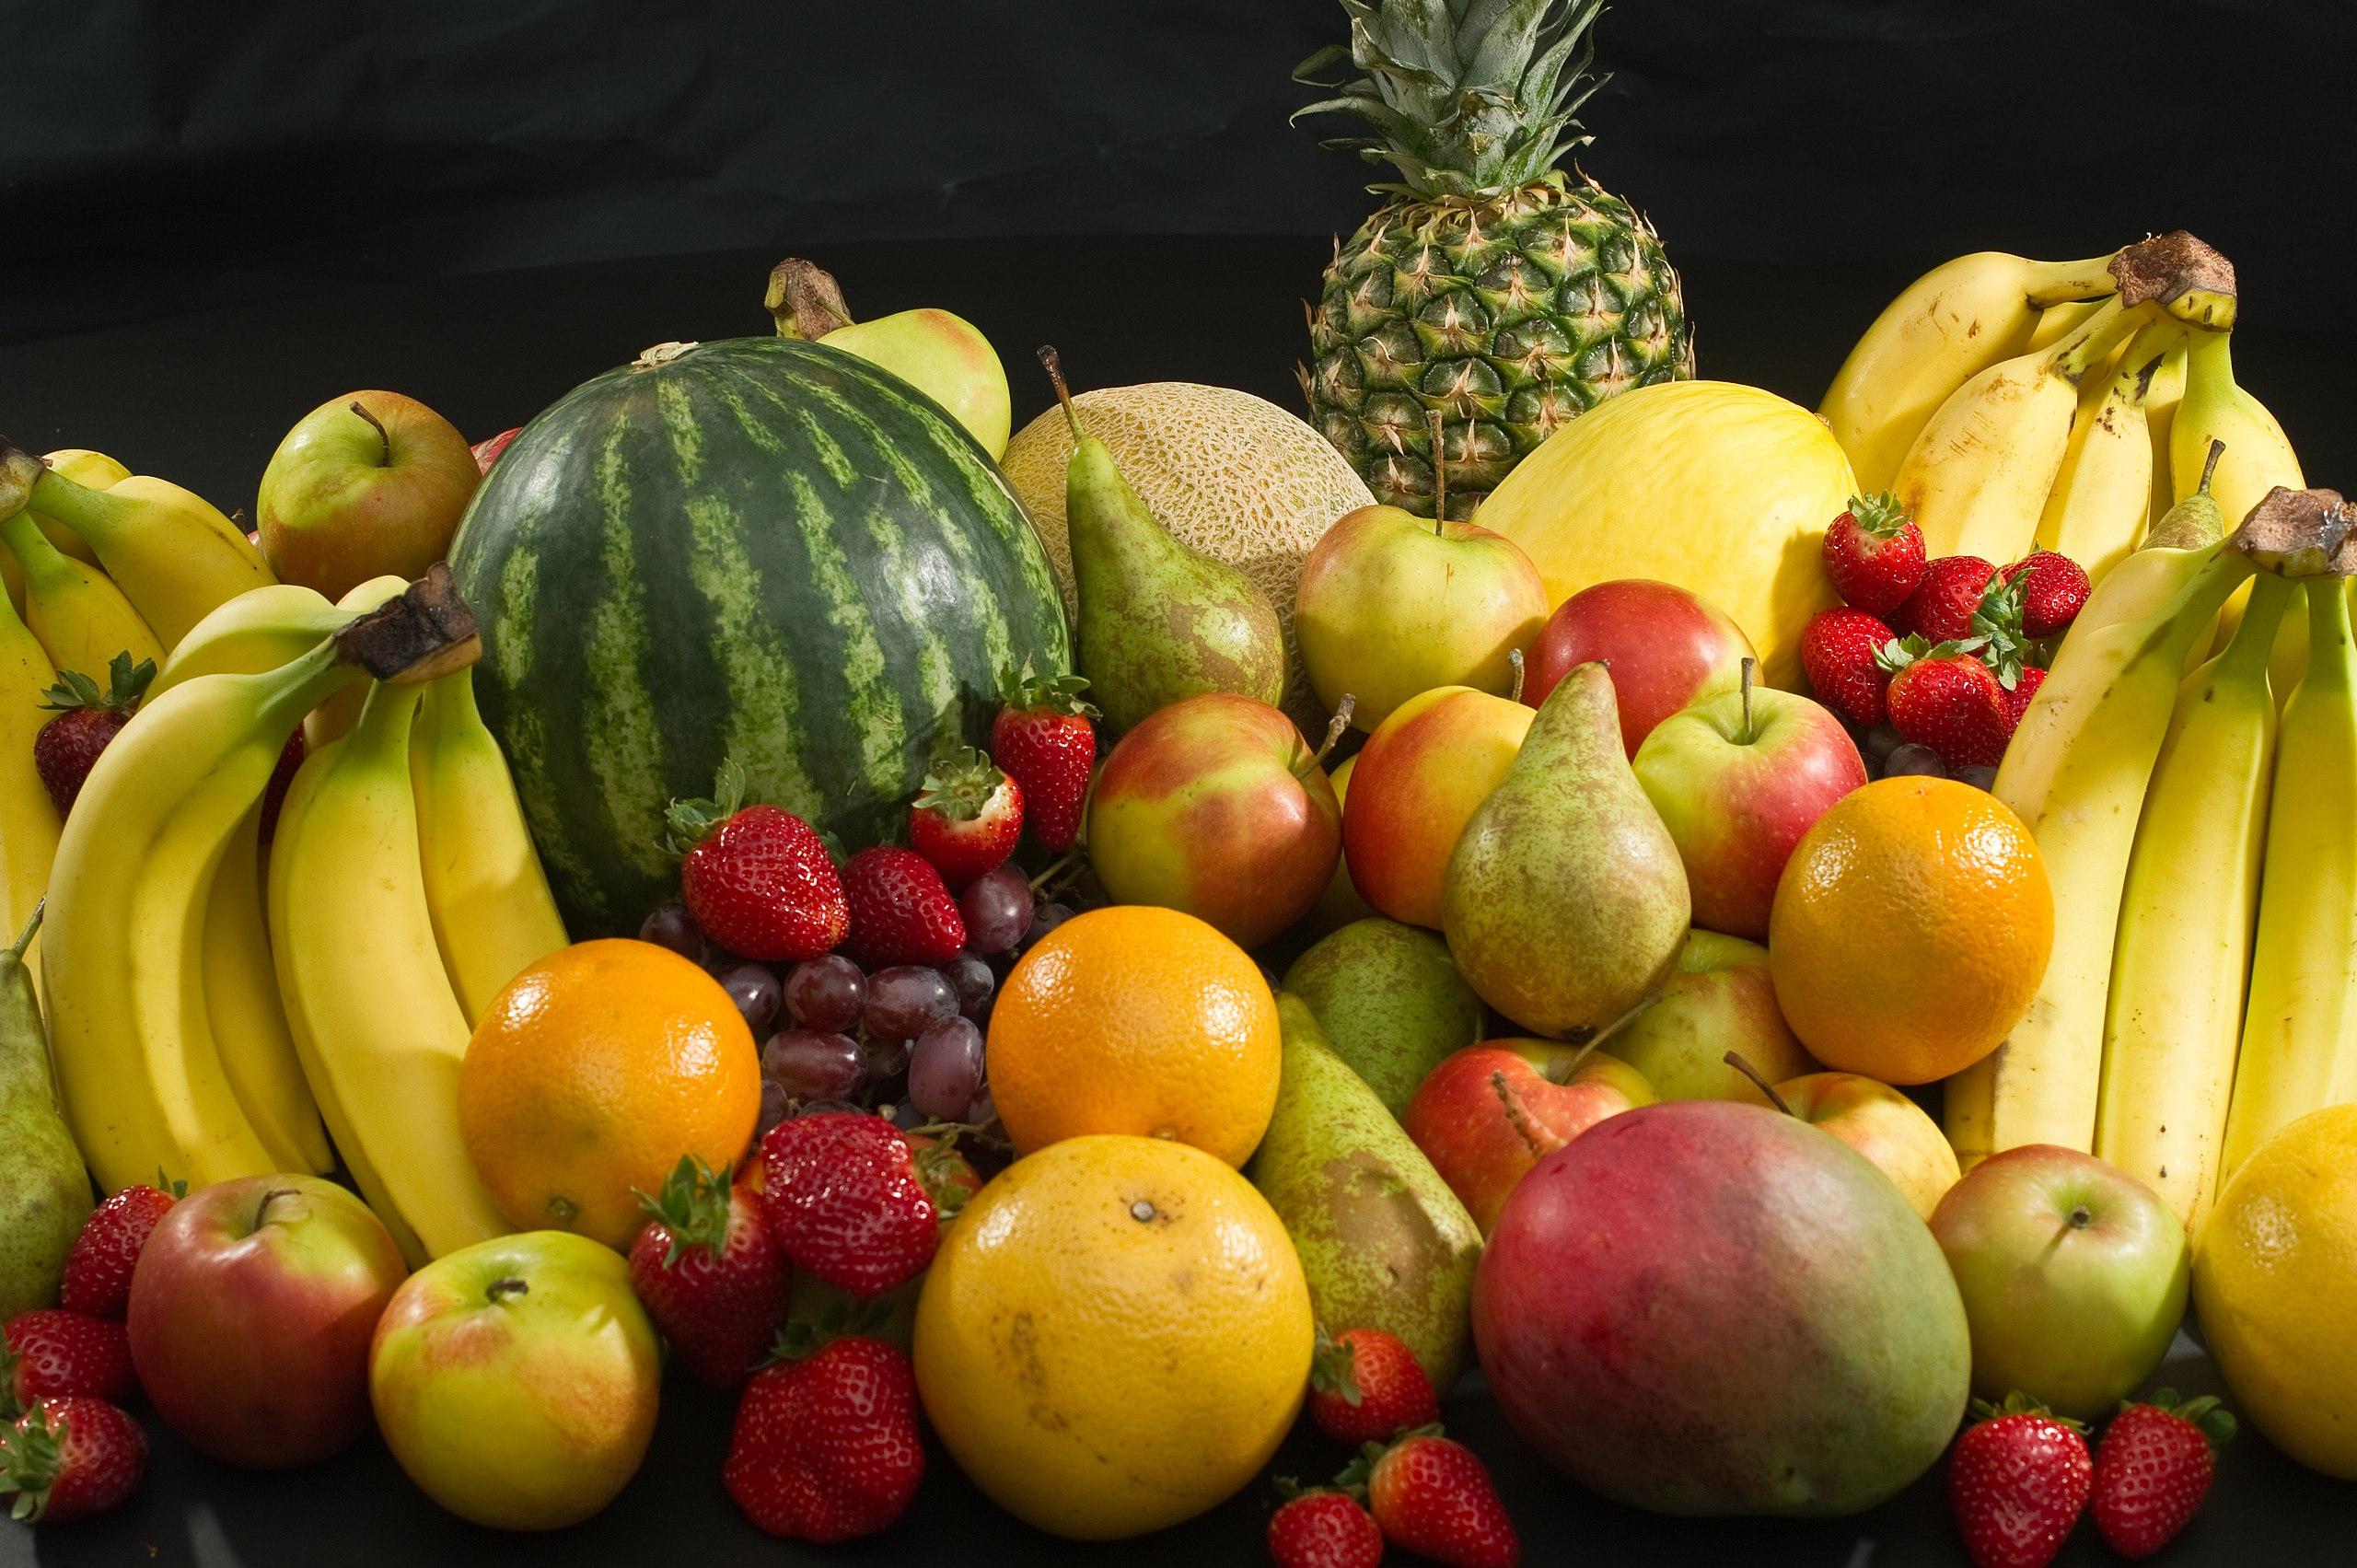 Culinary Fruit - Bananas